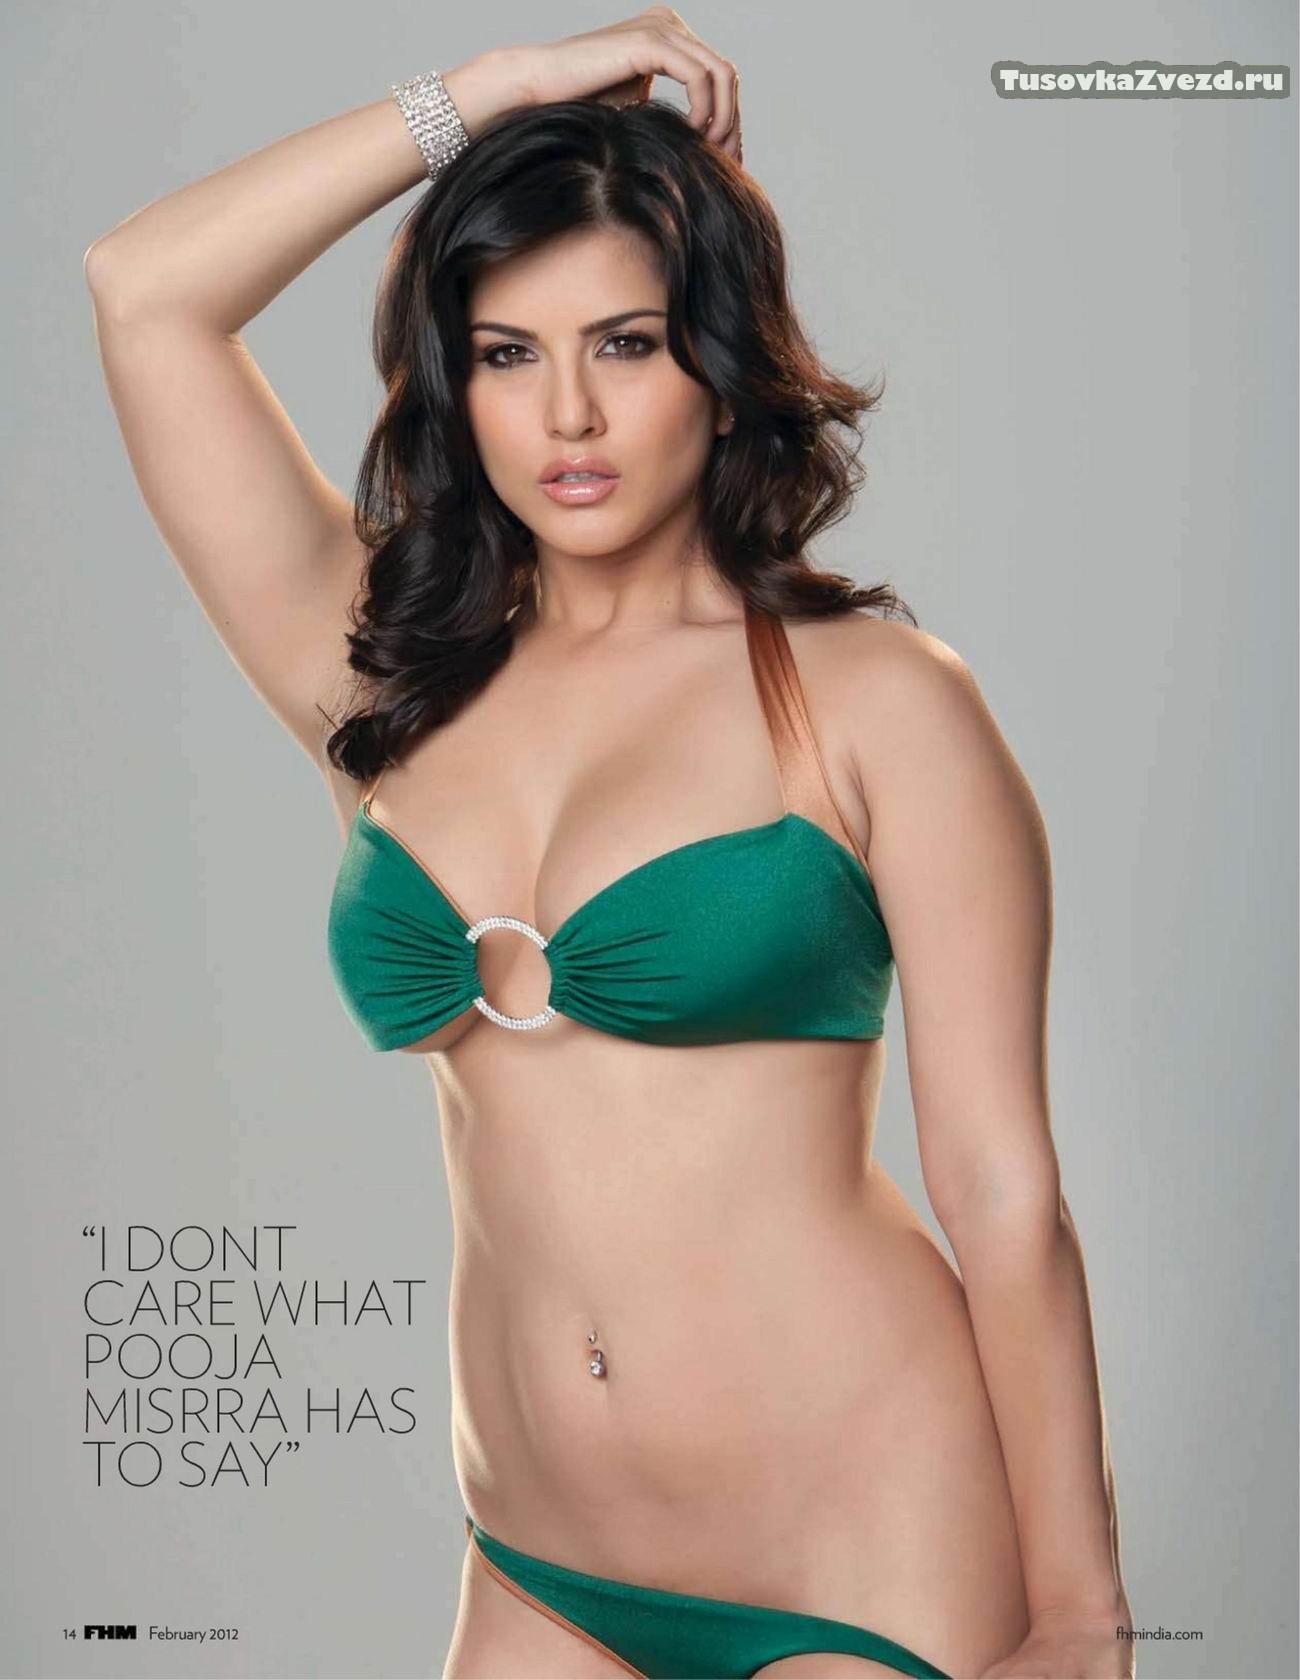 Санни Леоне (Sunny Leone) фото в журнале FHM Индия, февраль 2012